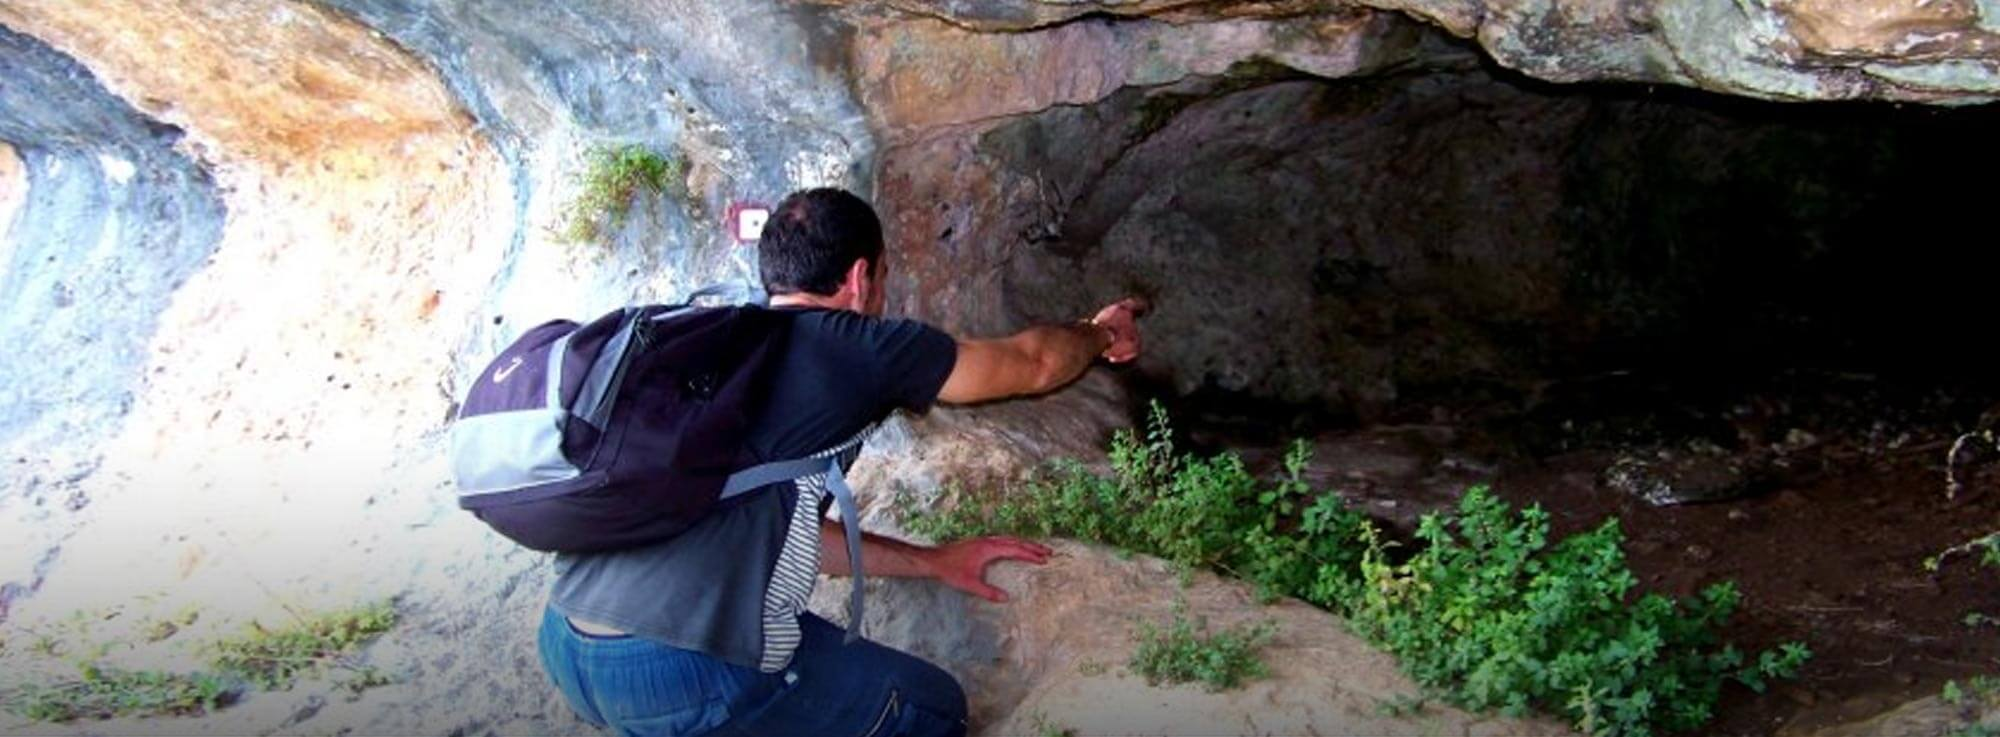 Selva di Fasano: Speleo Trekking